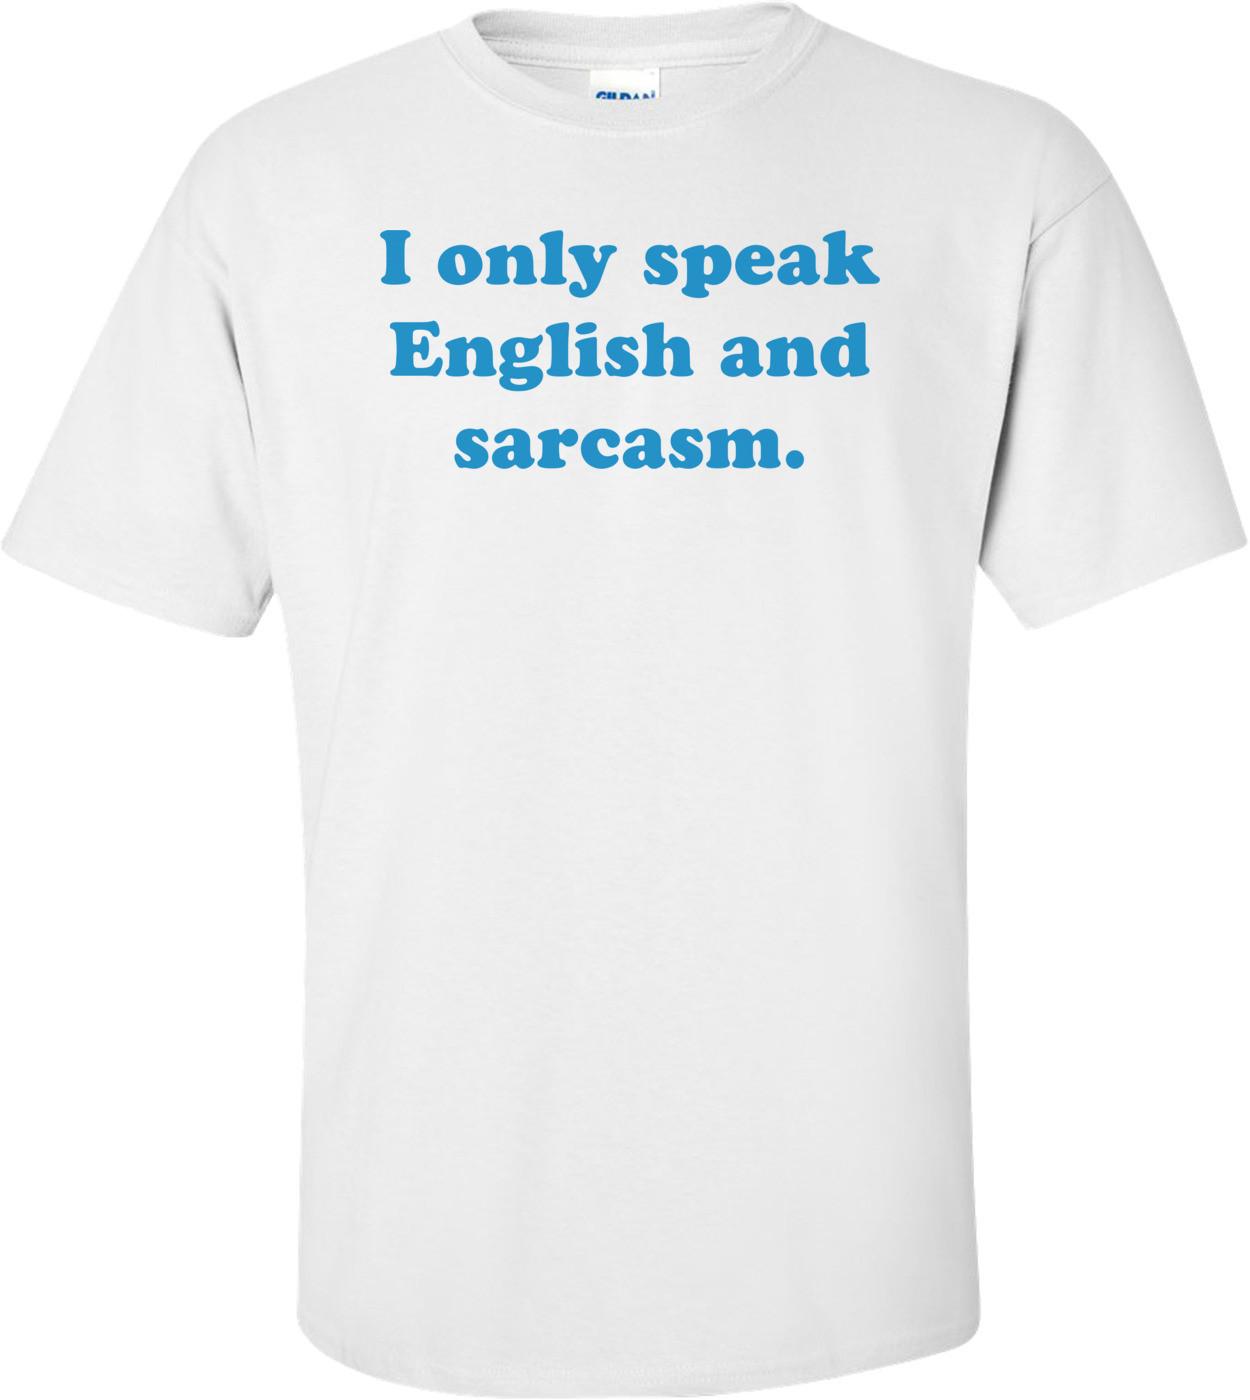 I only speak English and sarcasm. Shirt